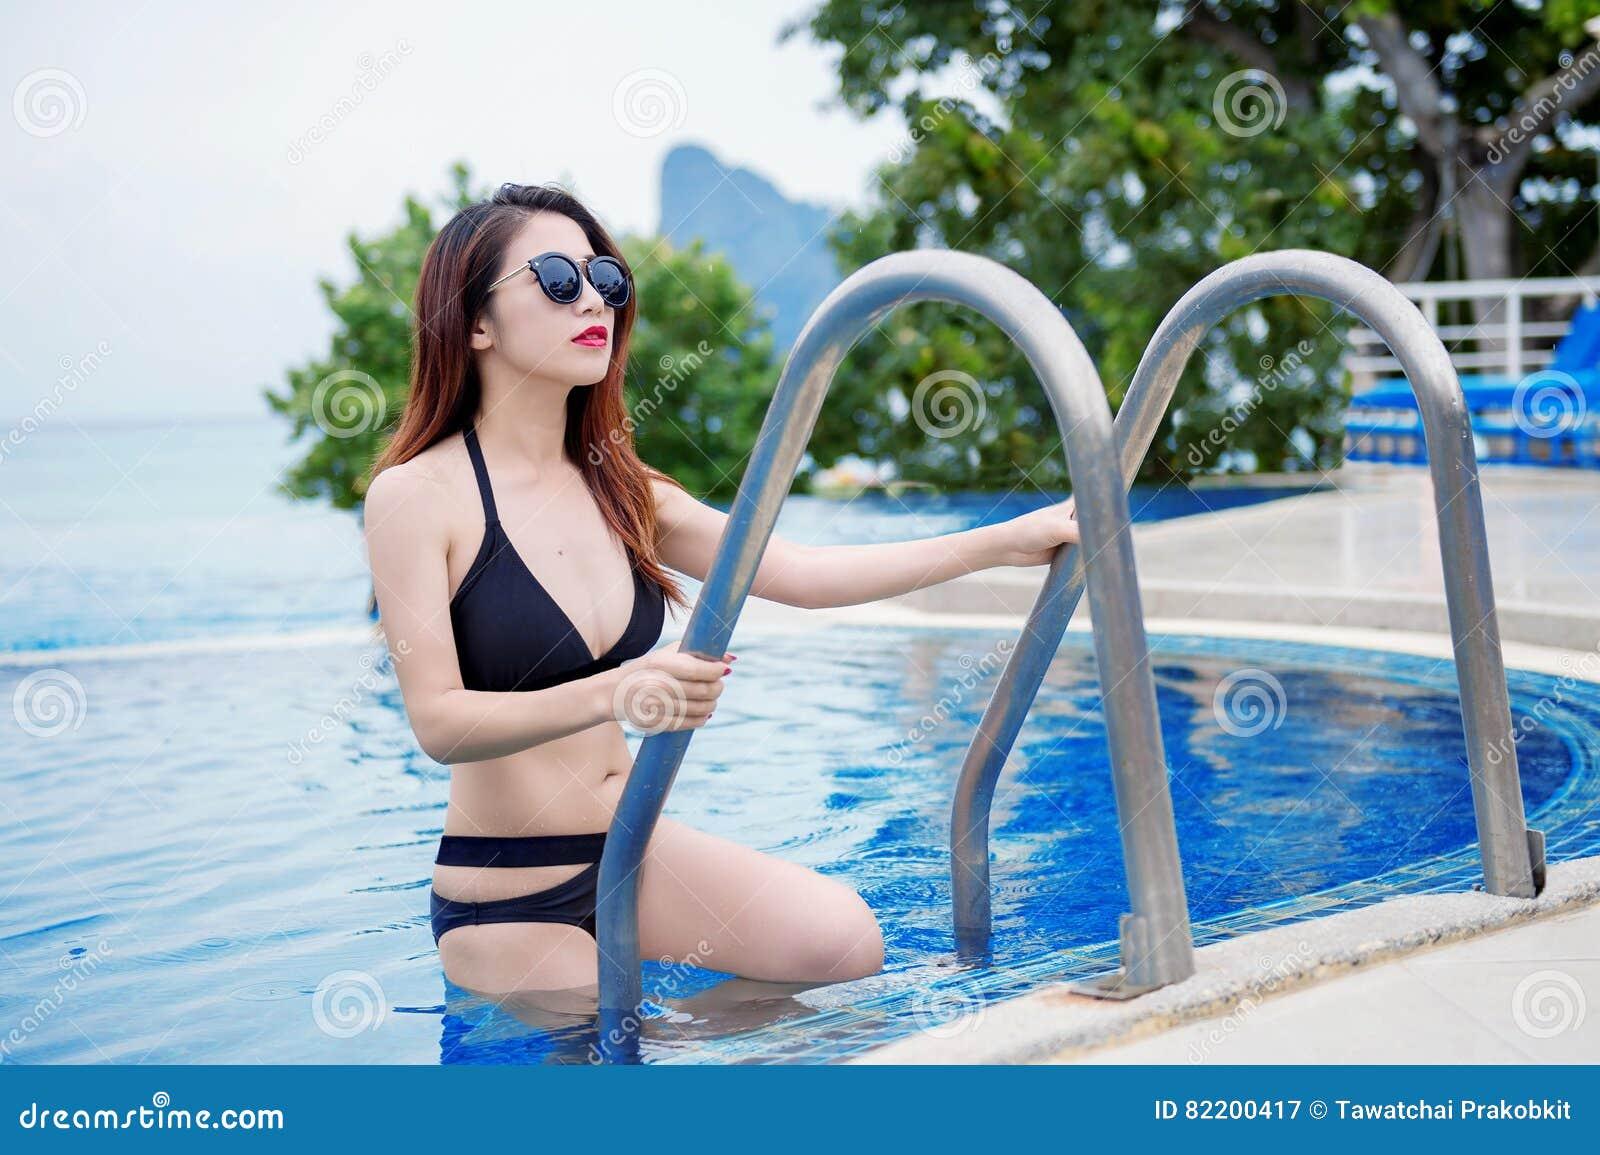 lizhut-devushka-v-chernom-bikini-u-basseyna